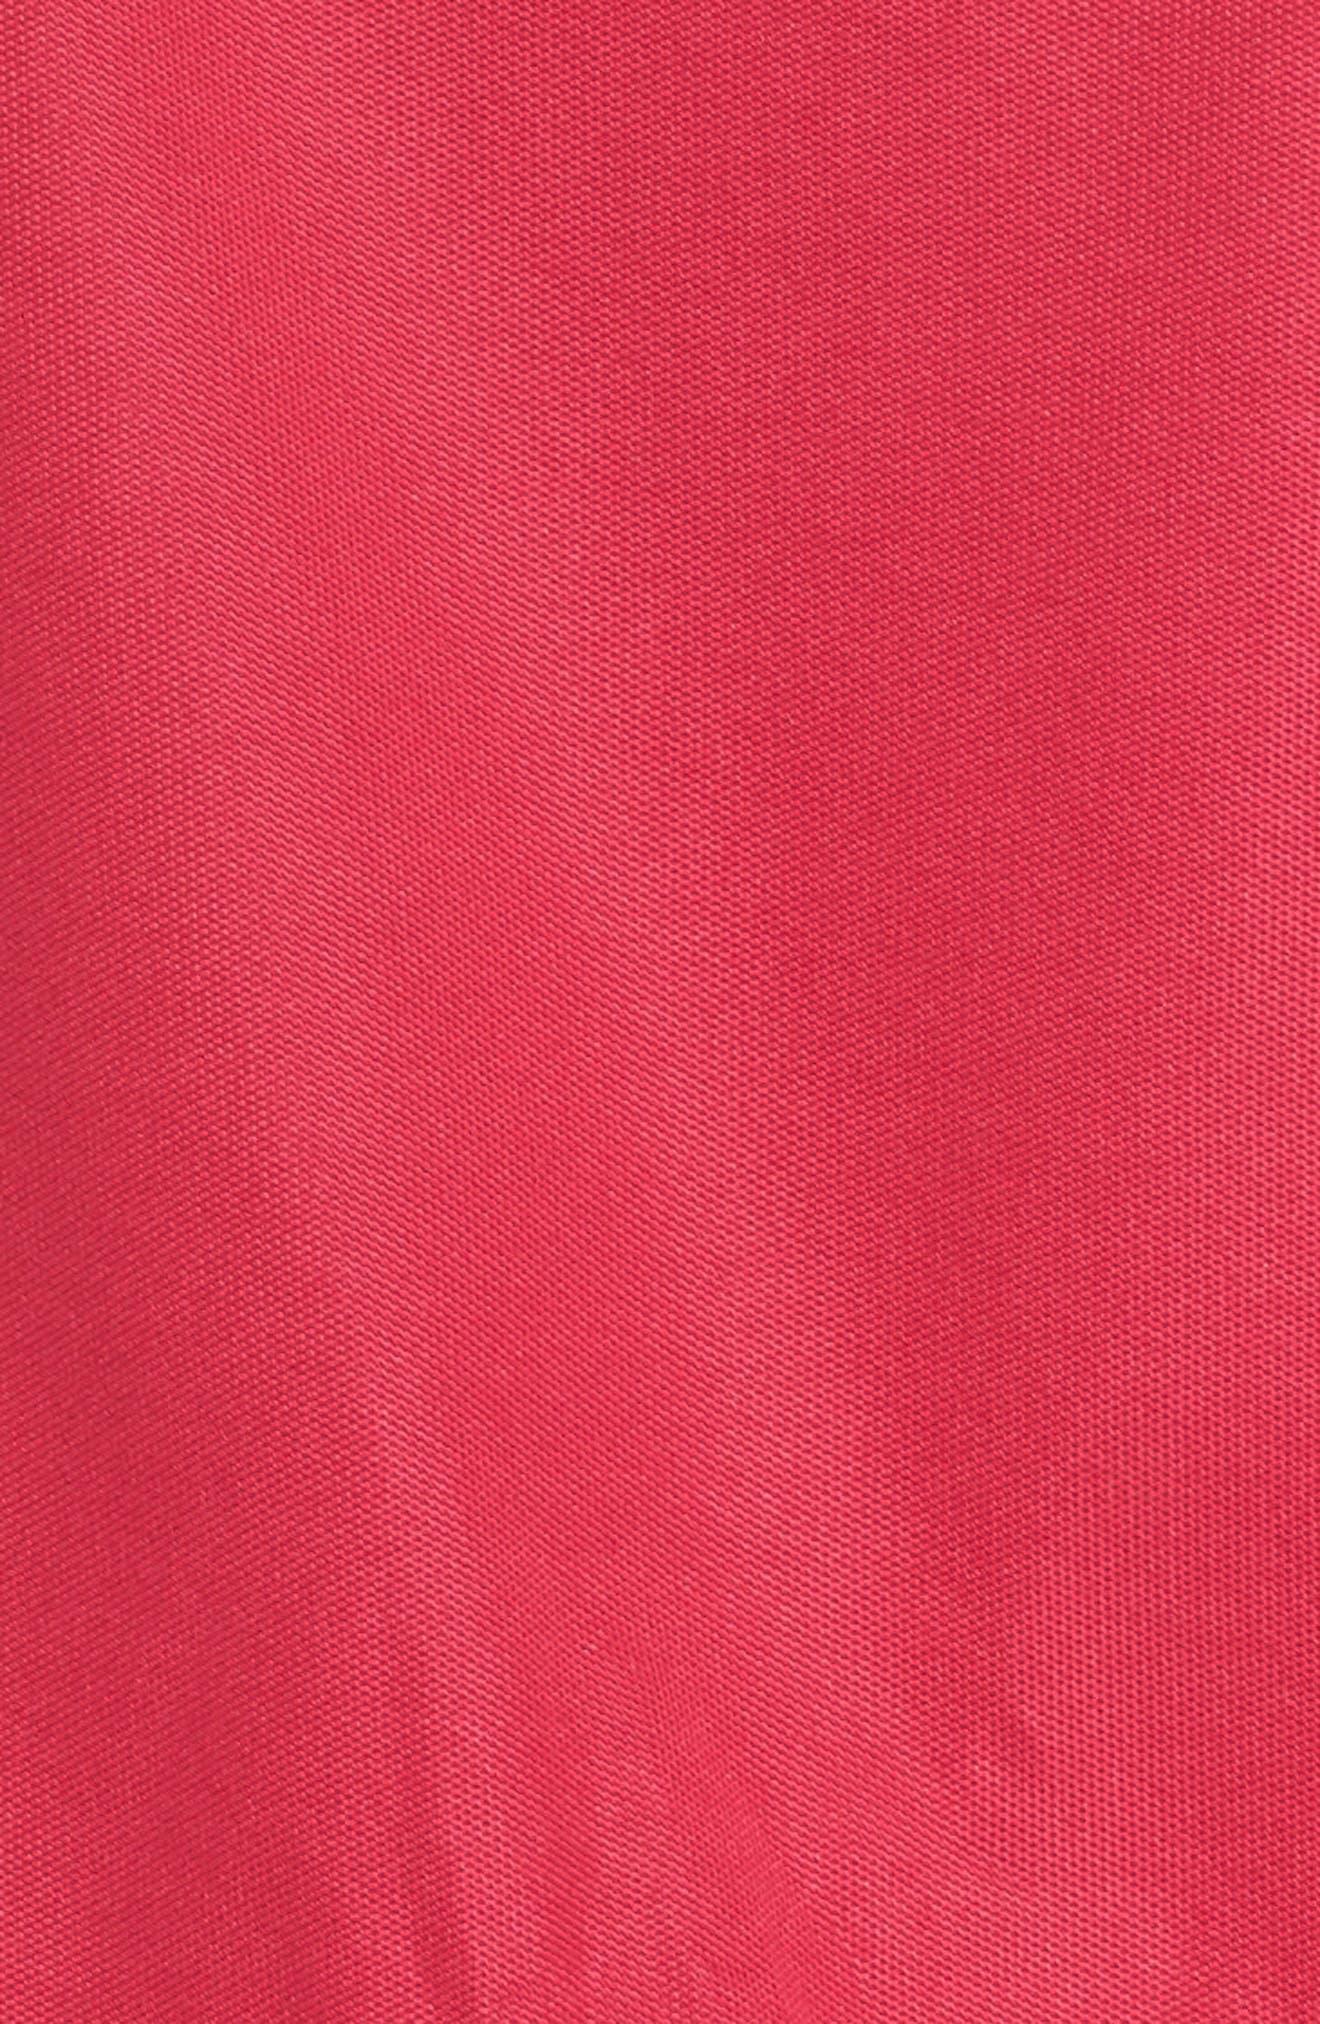 adidas Track Jacket,                             Alternate thumbnail 6, color,                             650